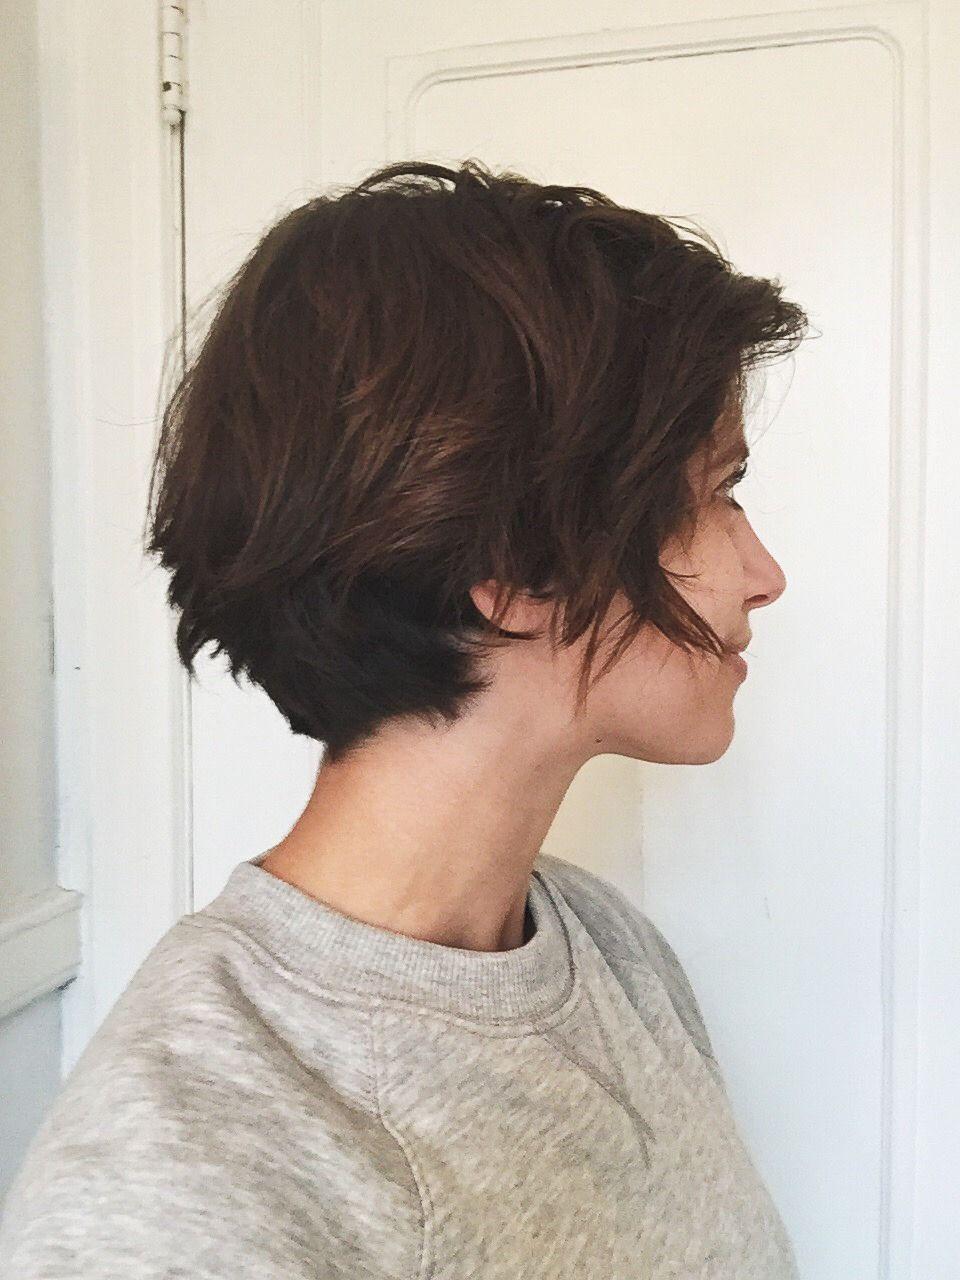 Grown Pixie Tumblr Short Hair Styles Short Wavy Hair Growing Out Short Hair Styles